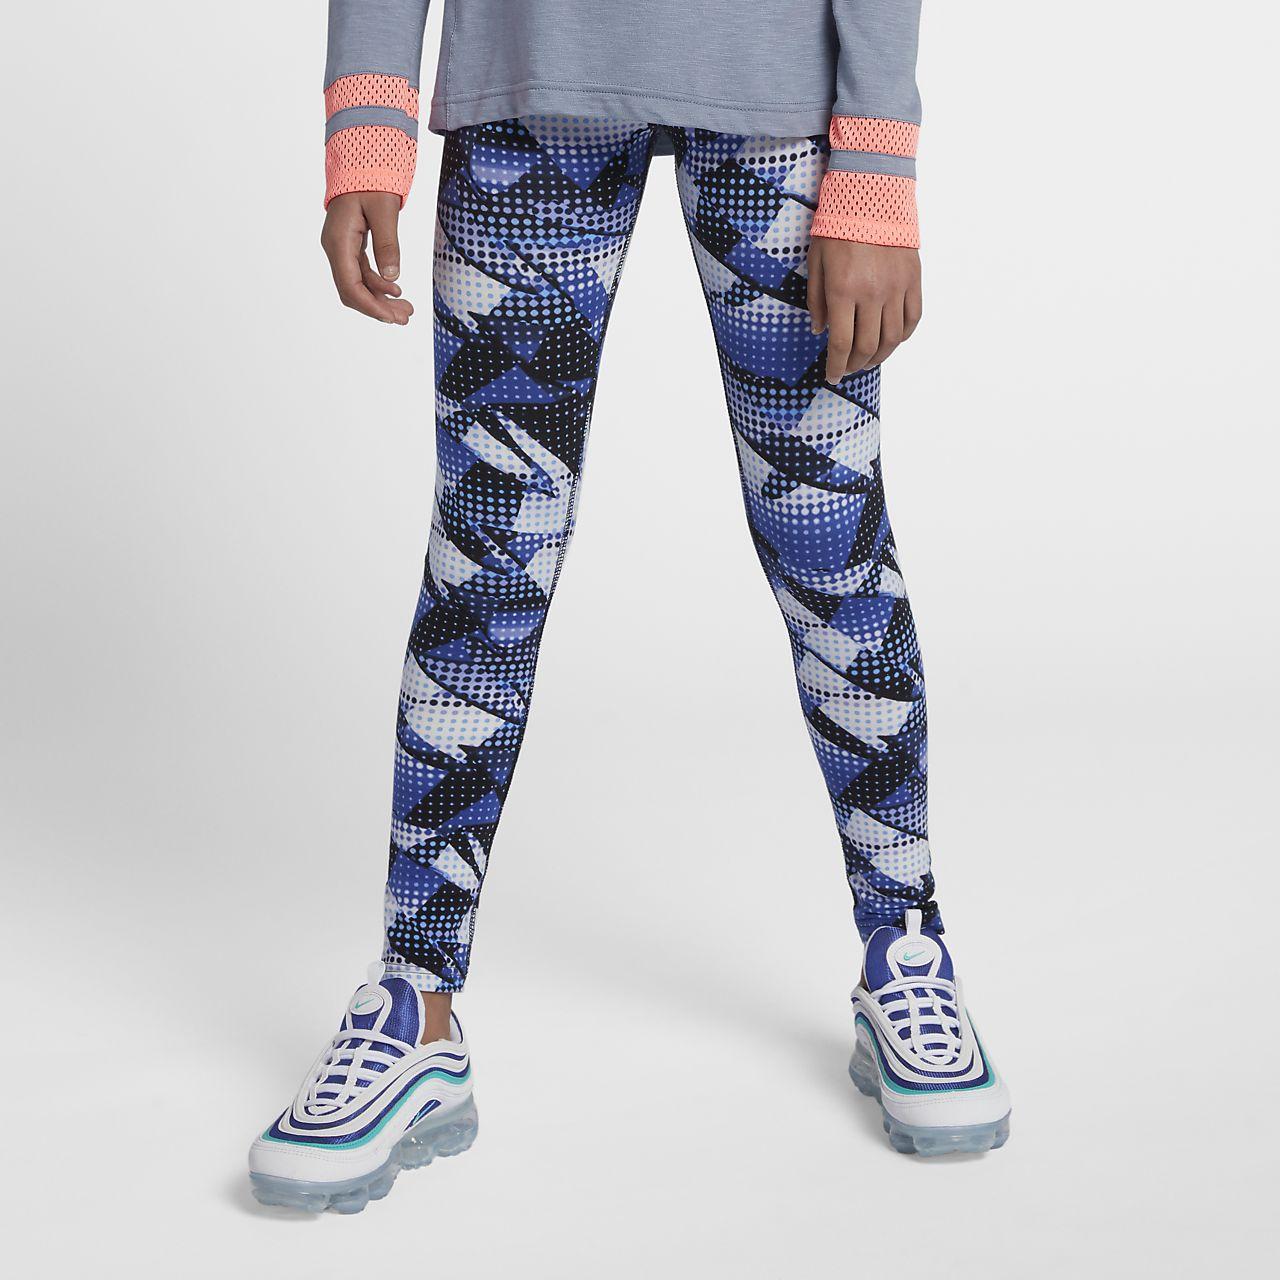 pretty nice 68517 2fb4a ... Nike Sportswear Big Kids  (Girls ) Printed Leggings